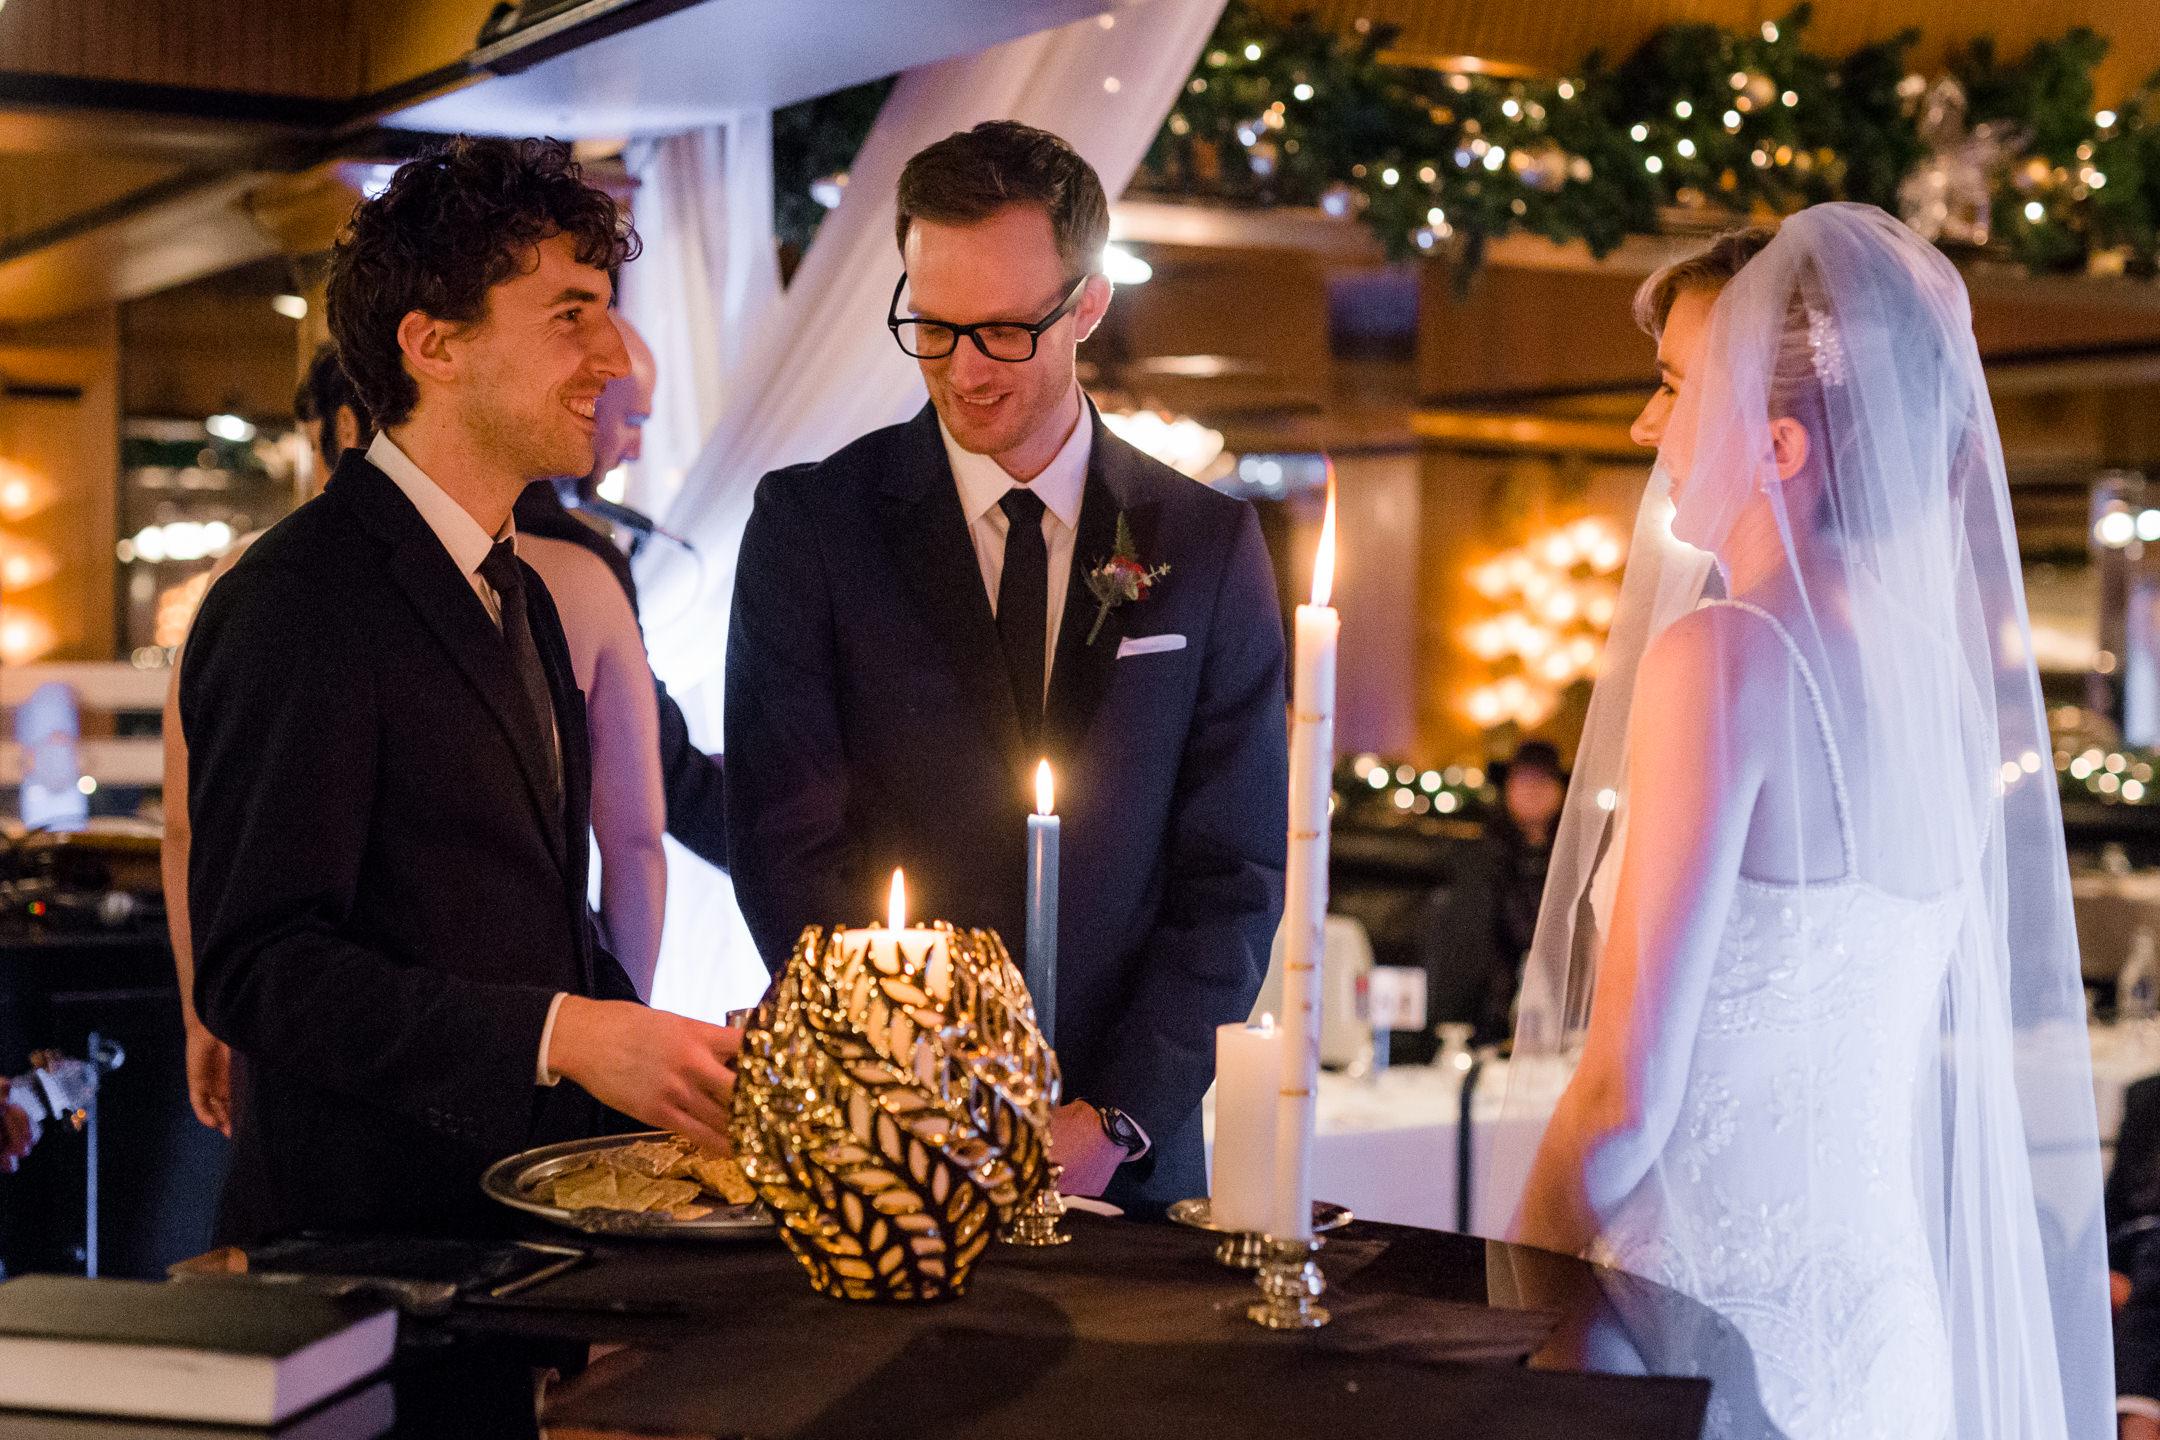 Documentary-Wedding-Photography-Andrew-Tat-Gabi & Kim-16.jpg